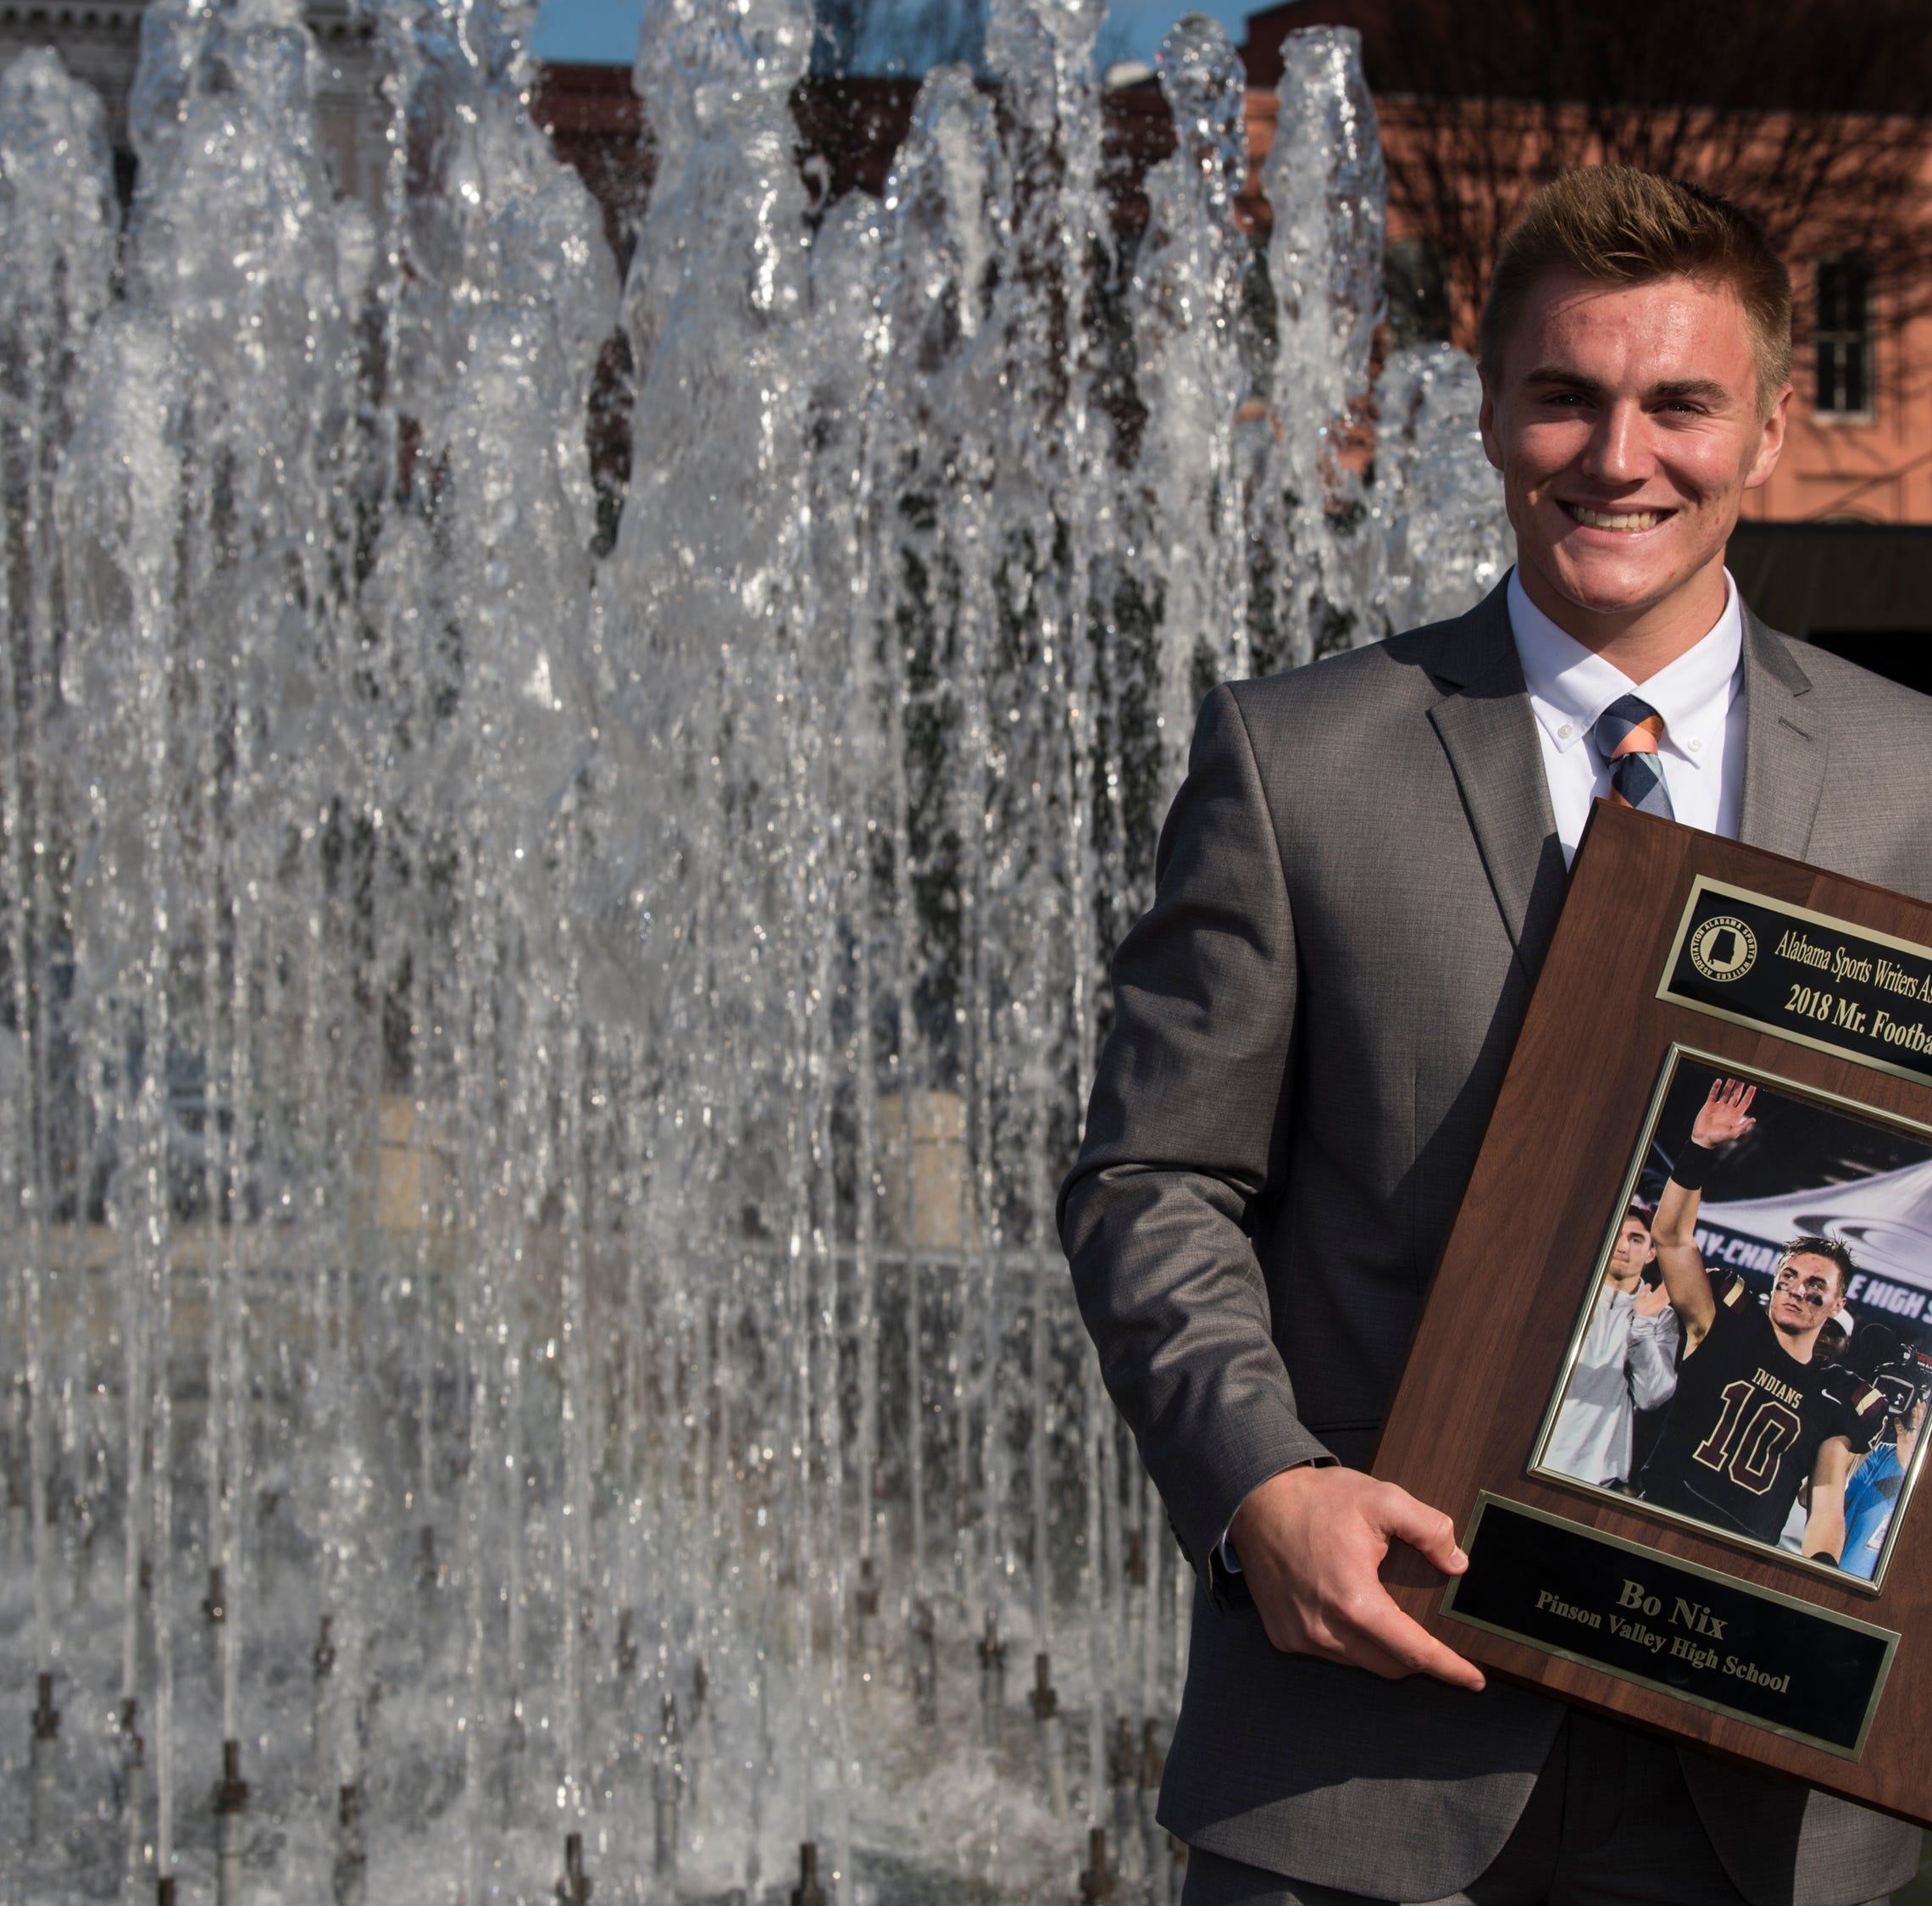 Nix turns Mr. Football trick, lands state's biggest prep football award